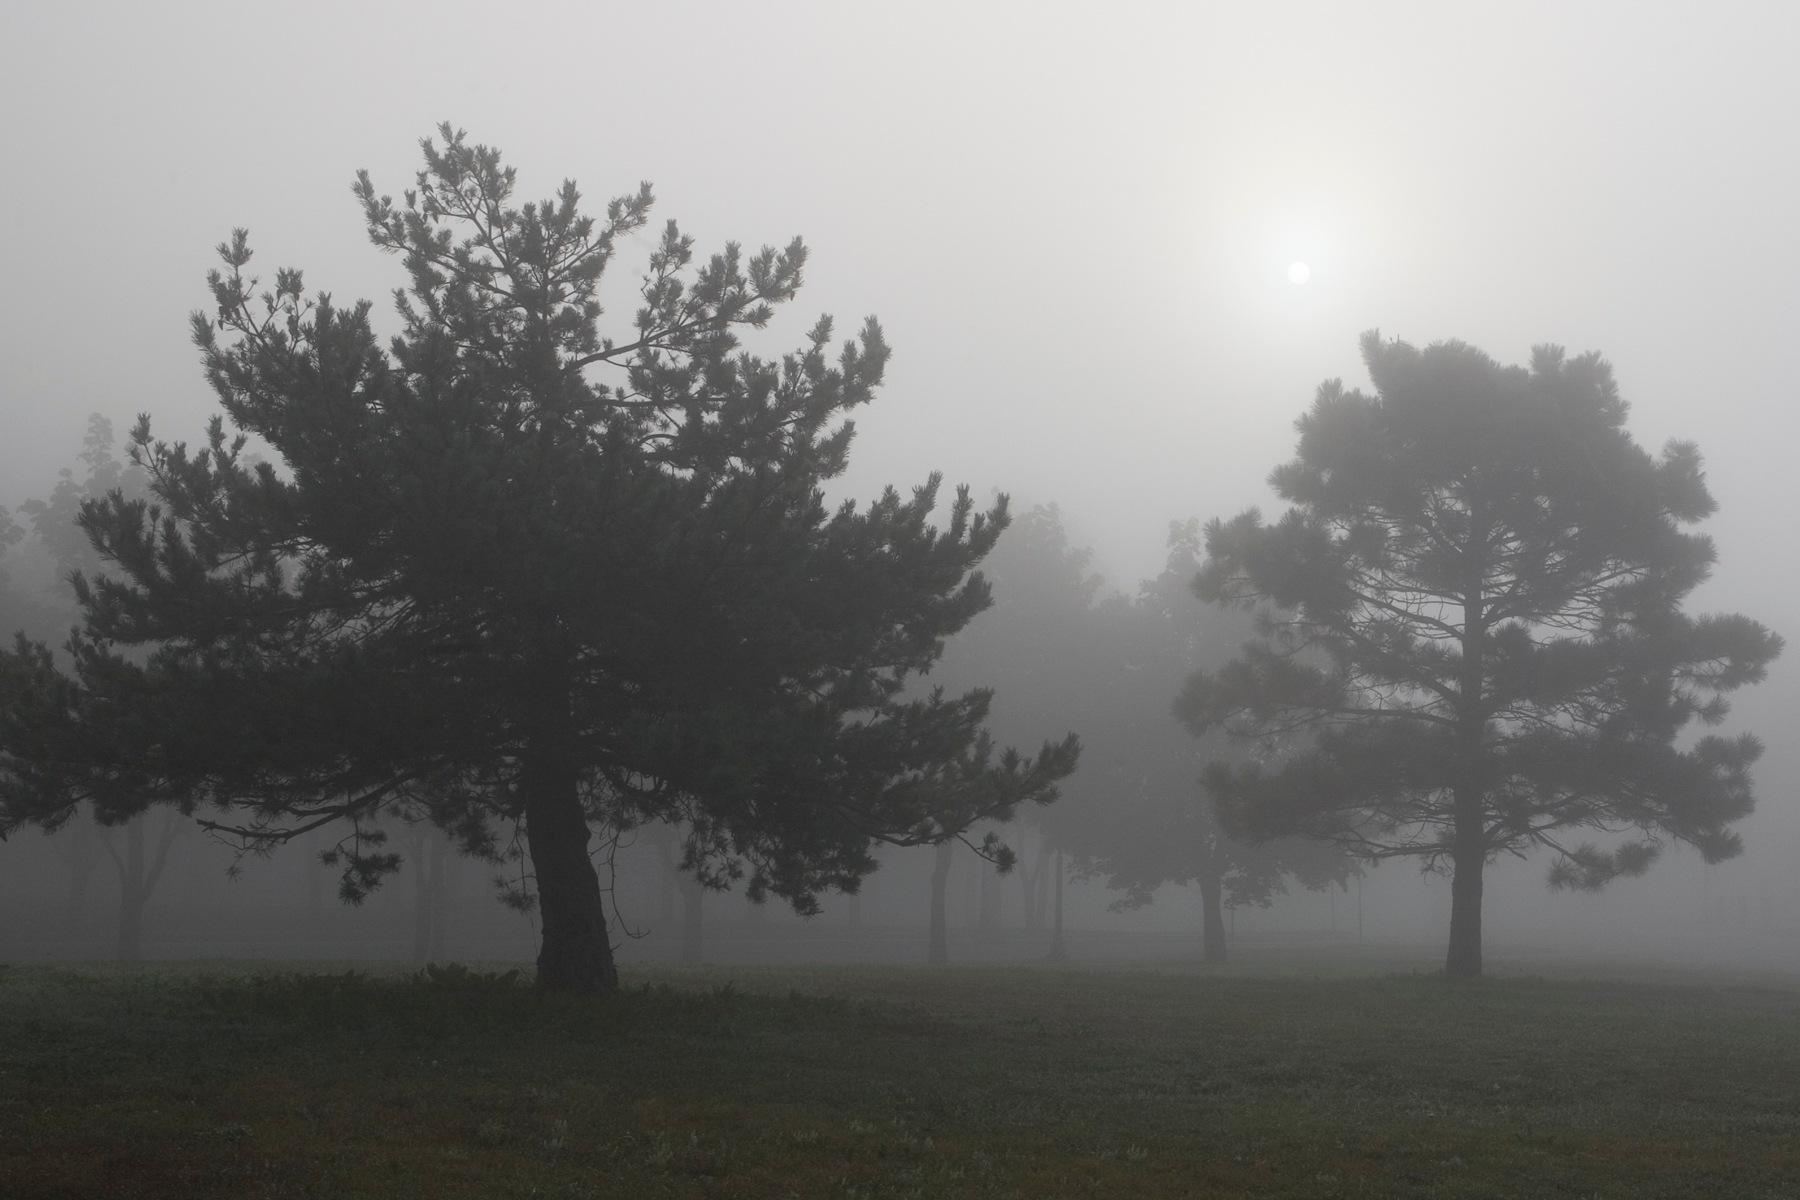 Sun poking through fog over trees by Bernard Mordorski